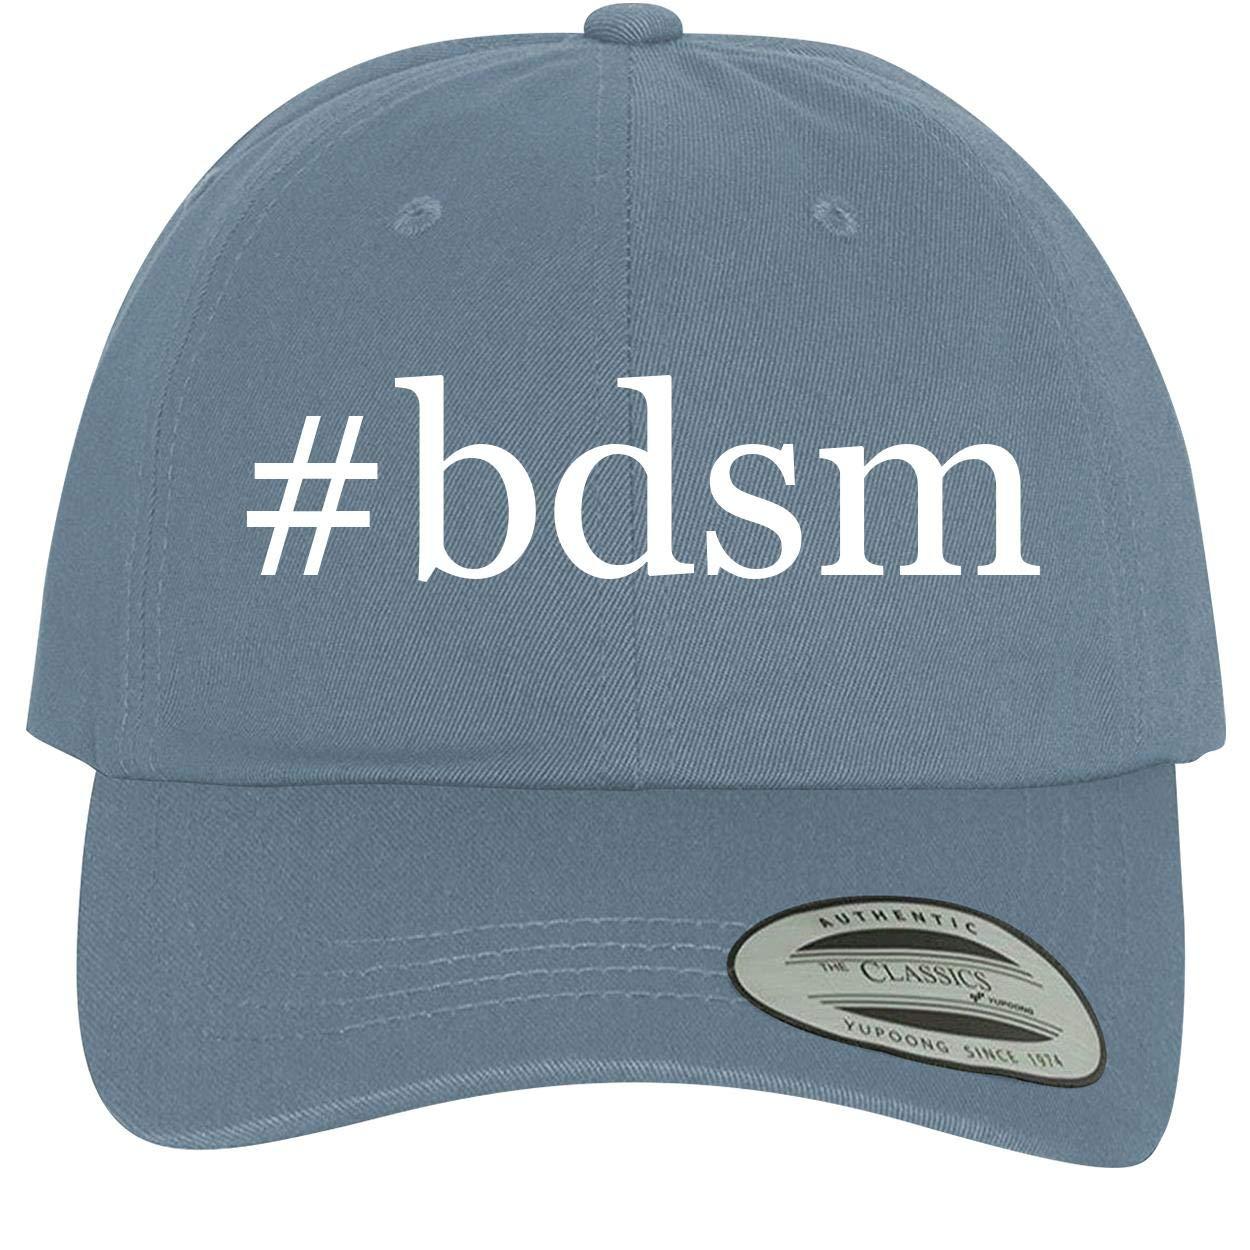 Comfortable Dad Hat Baseball Cap BH Cool Designs #BDSM